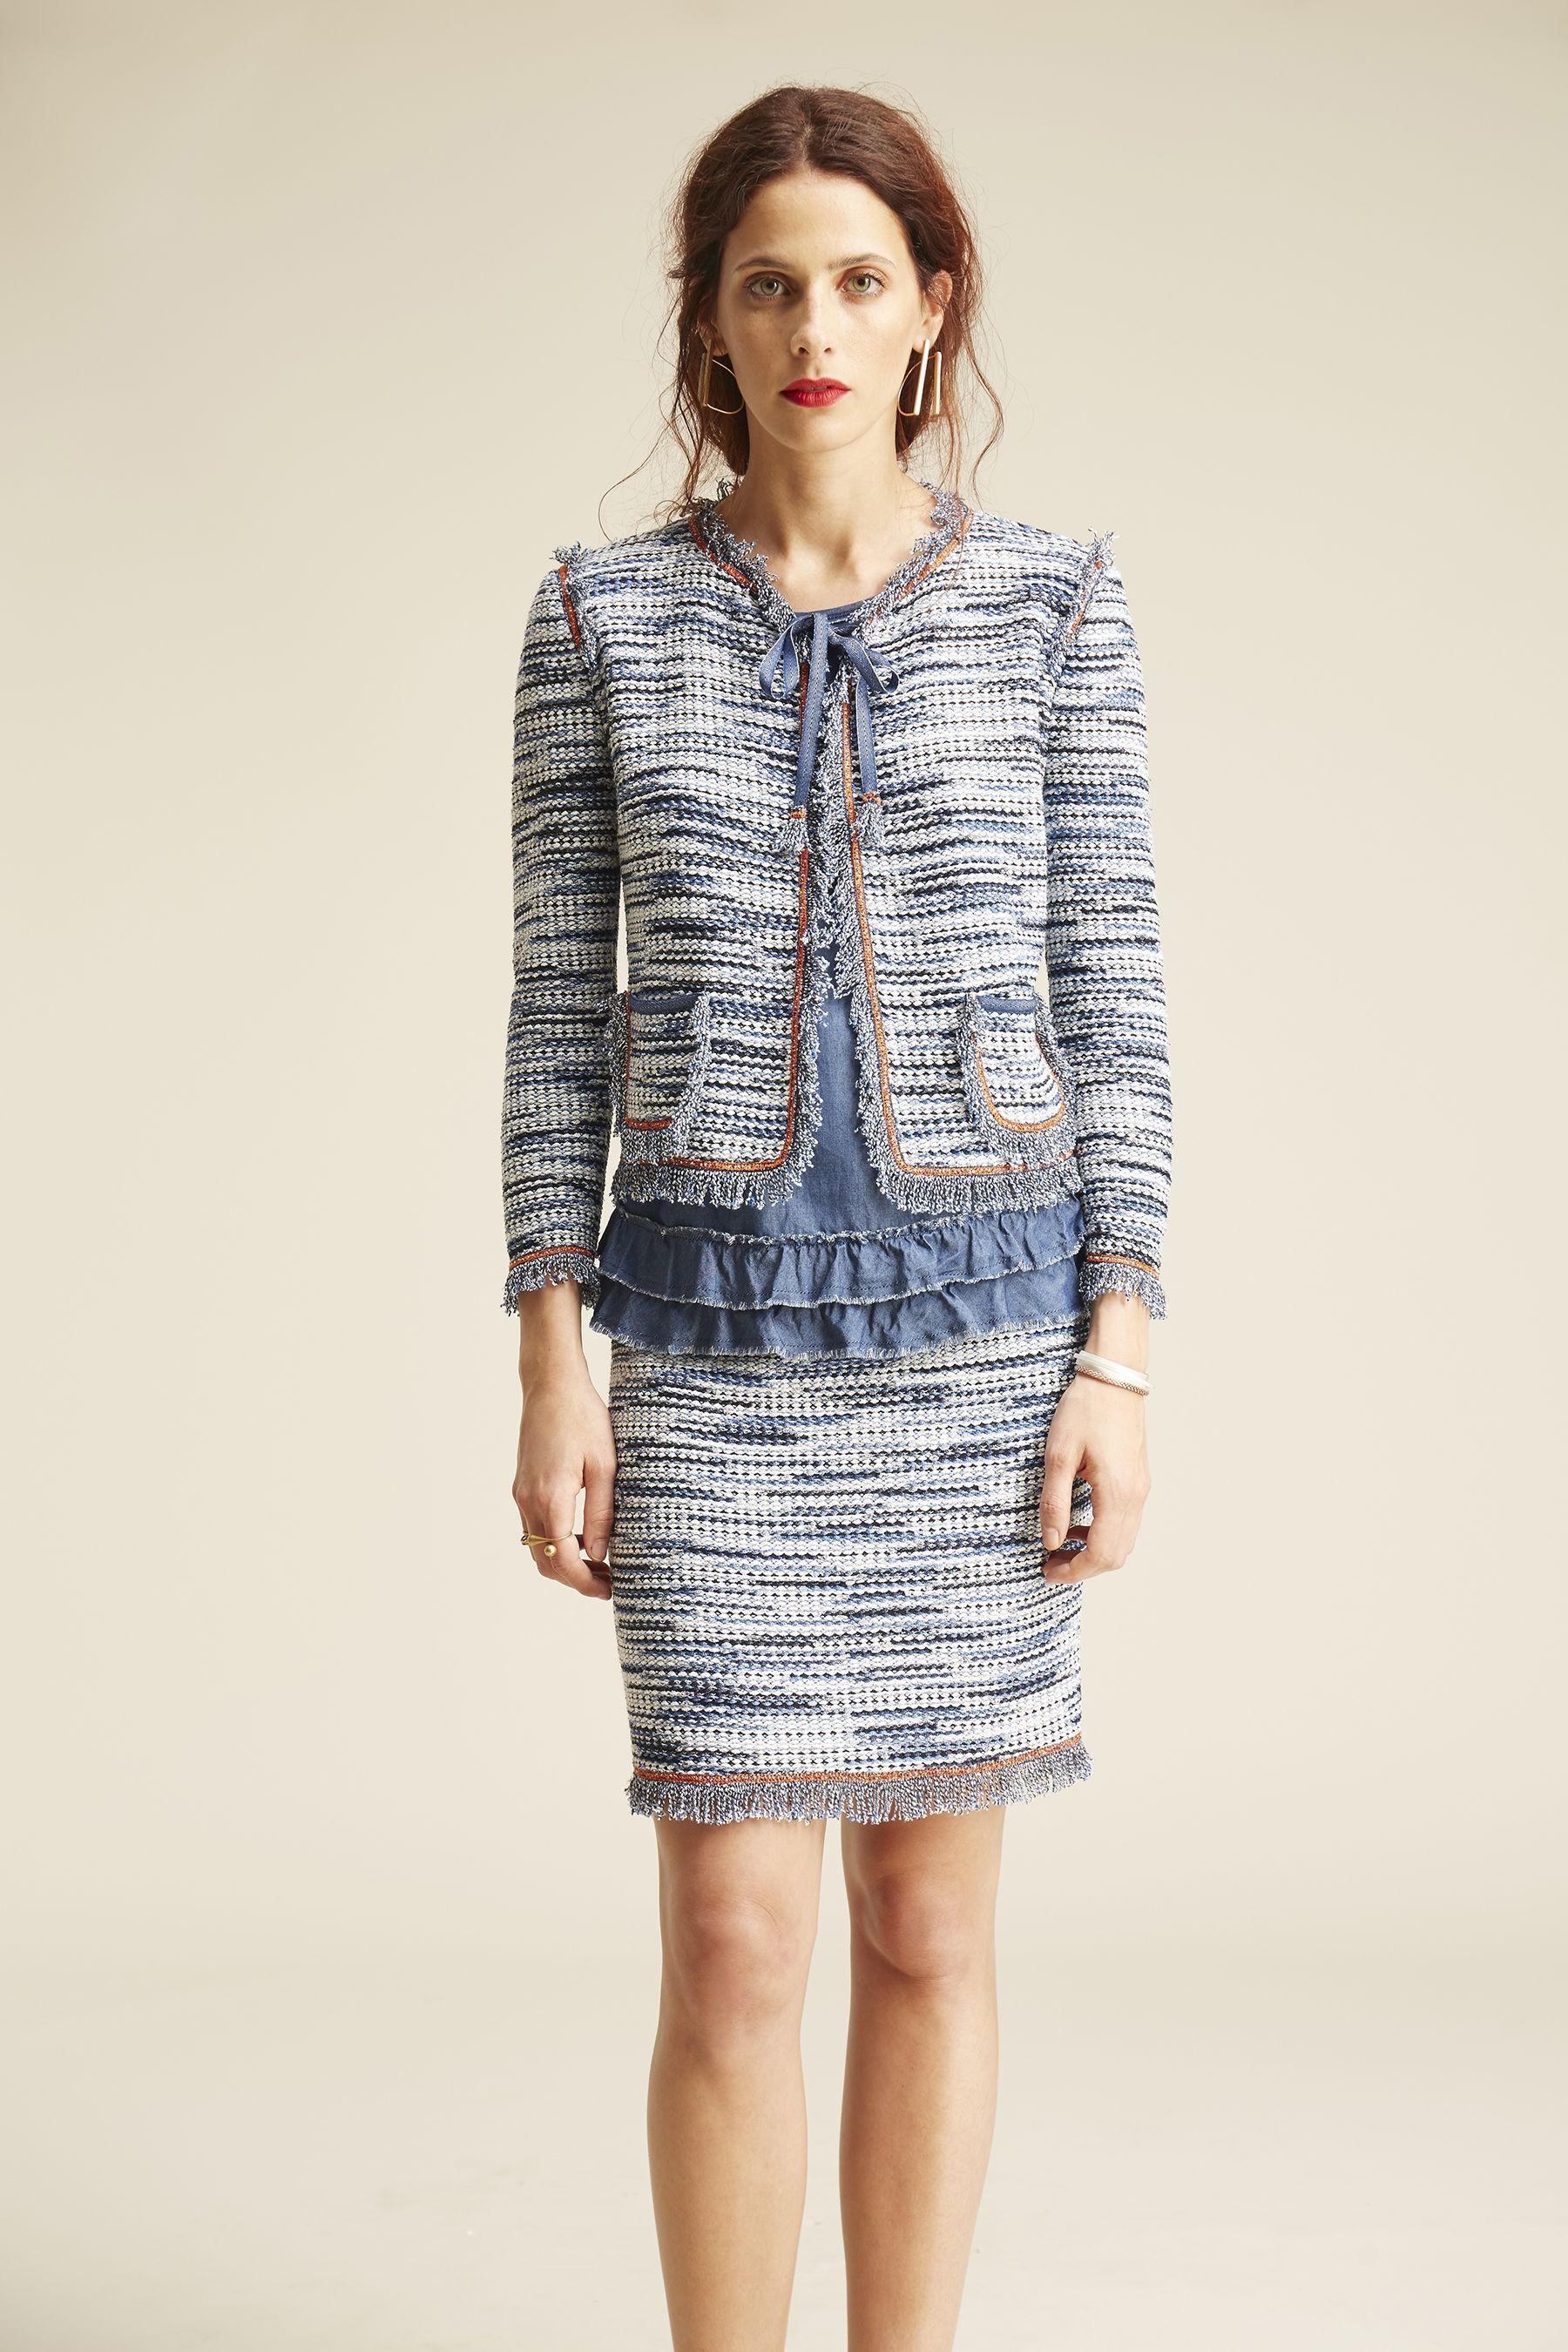 CHAQUETA CHANEL | Costura, patrones, ideas... | Pinterest | Costura ...